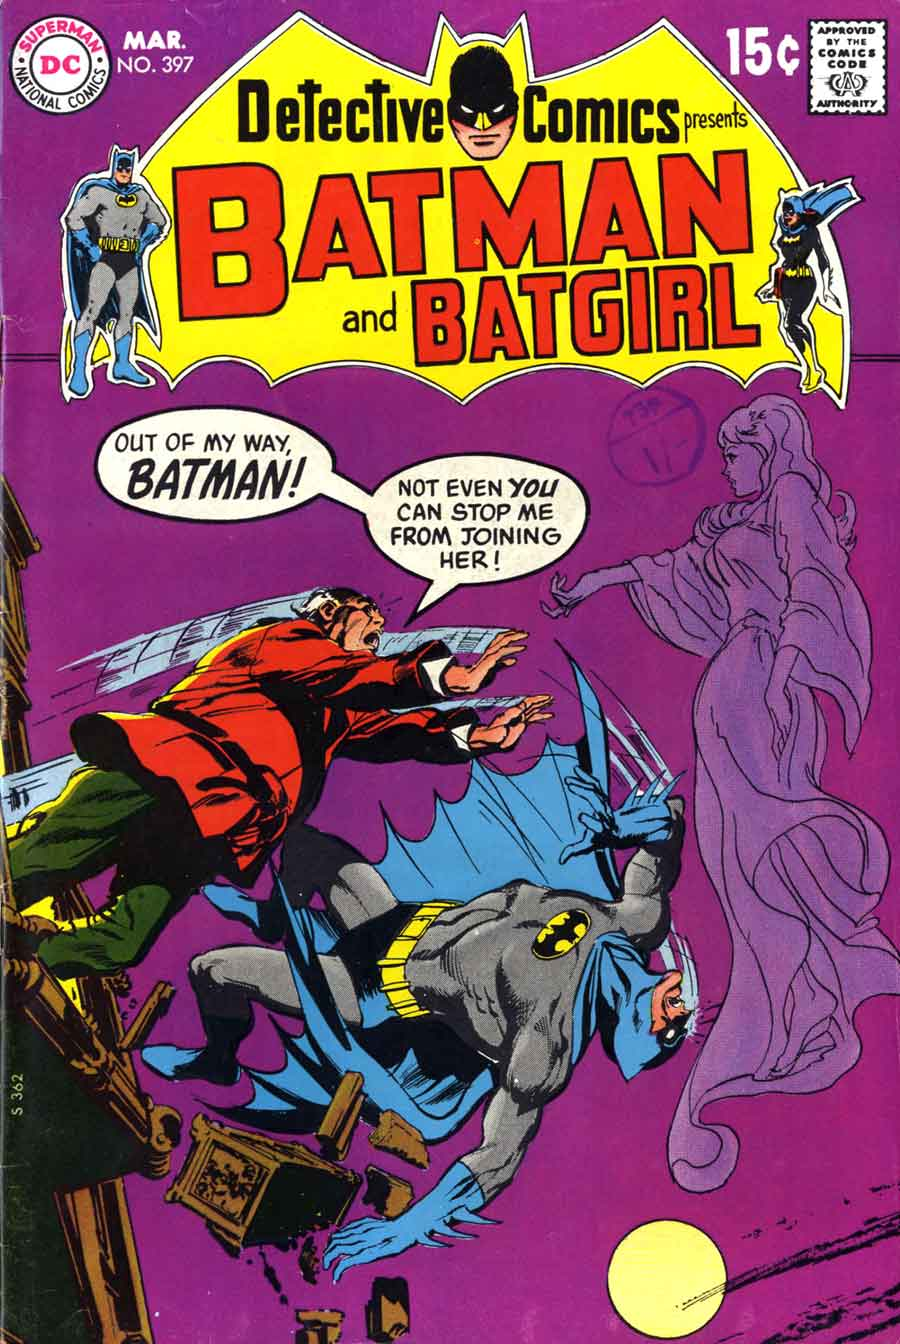 Detective Comics #397 dc Batman comic book cover art by Neal Adams